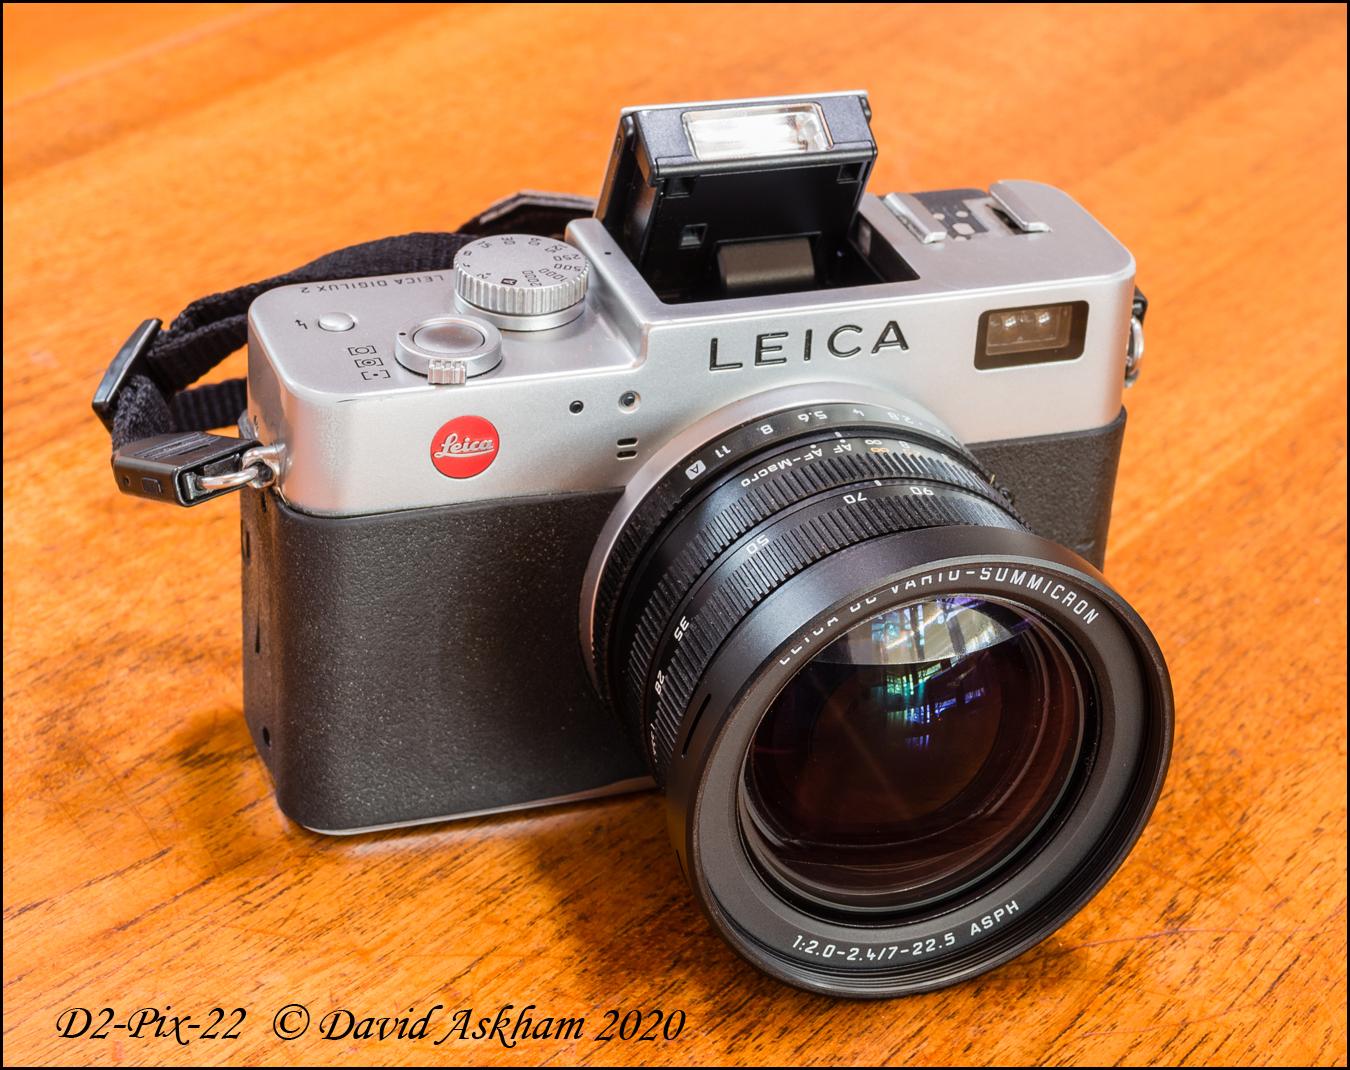 Digilux 2 with flash set to 45° (Taken with Leica X-Vario)